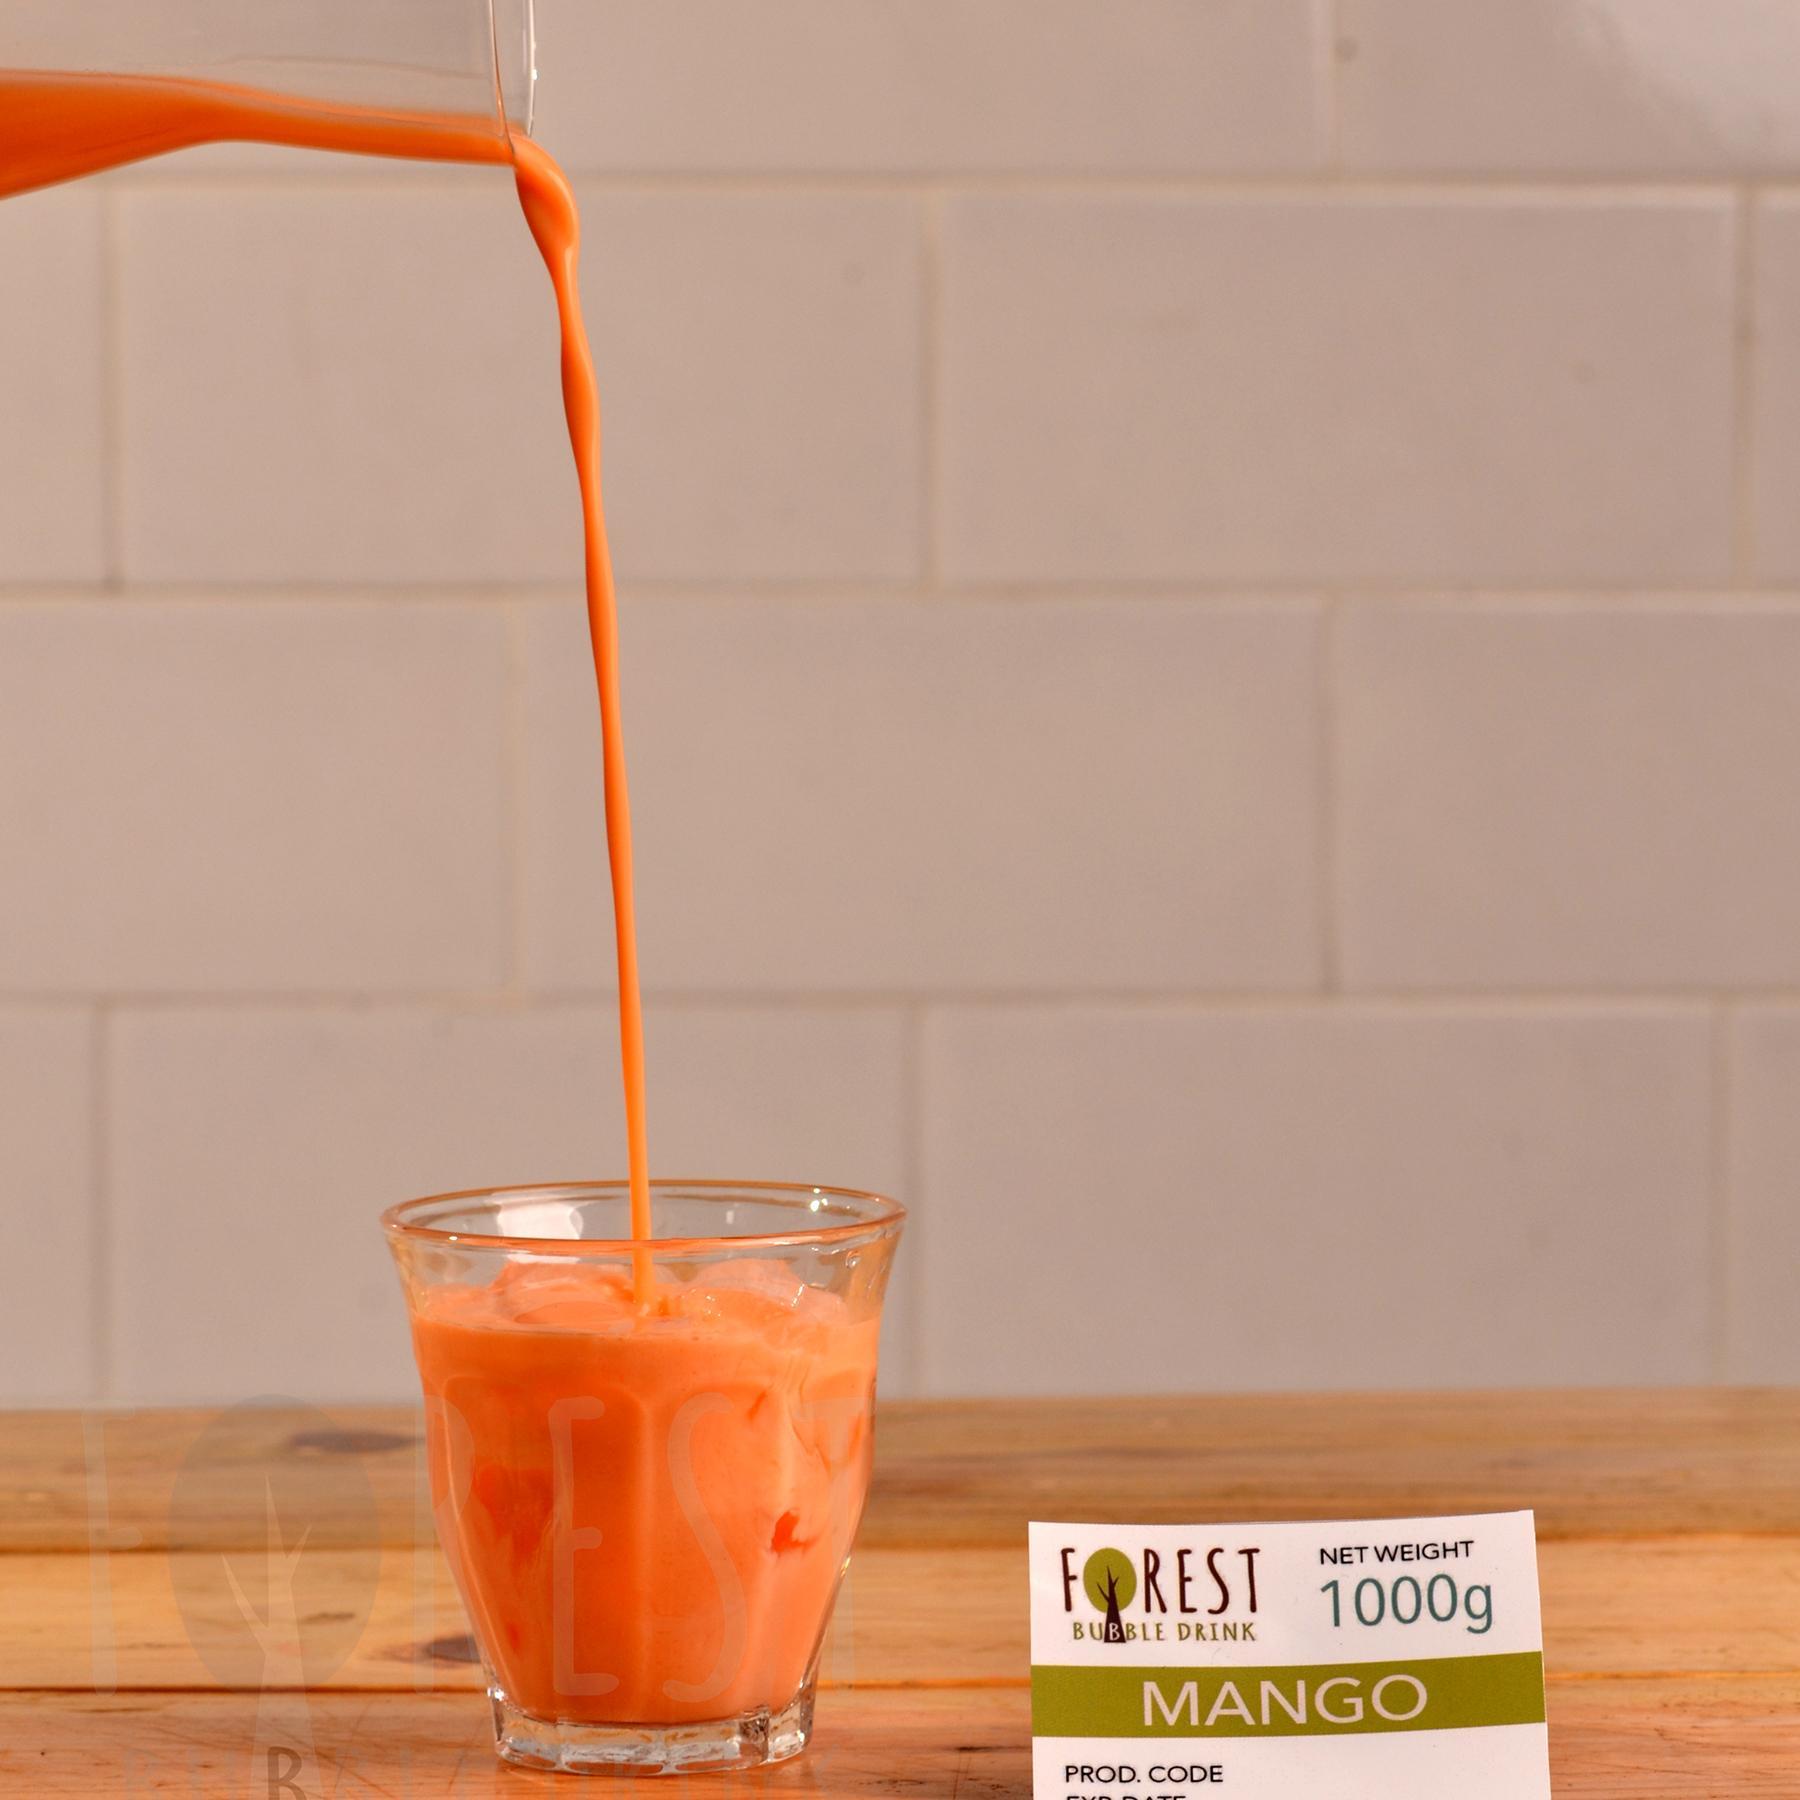 Bubuk Minuman MANGO Powder 1000g - Forest Bubble Drink